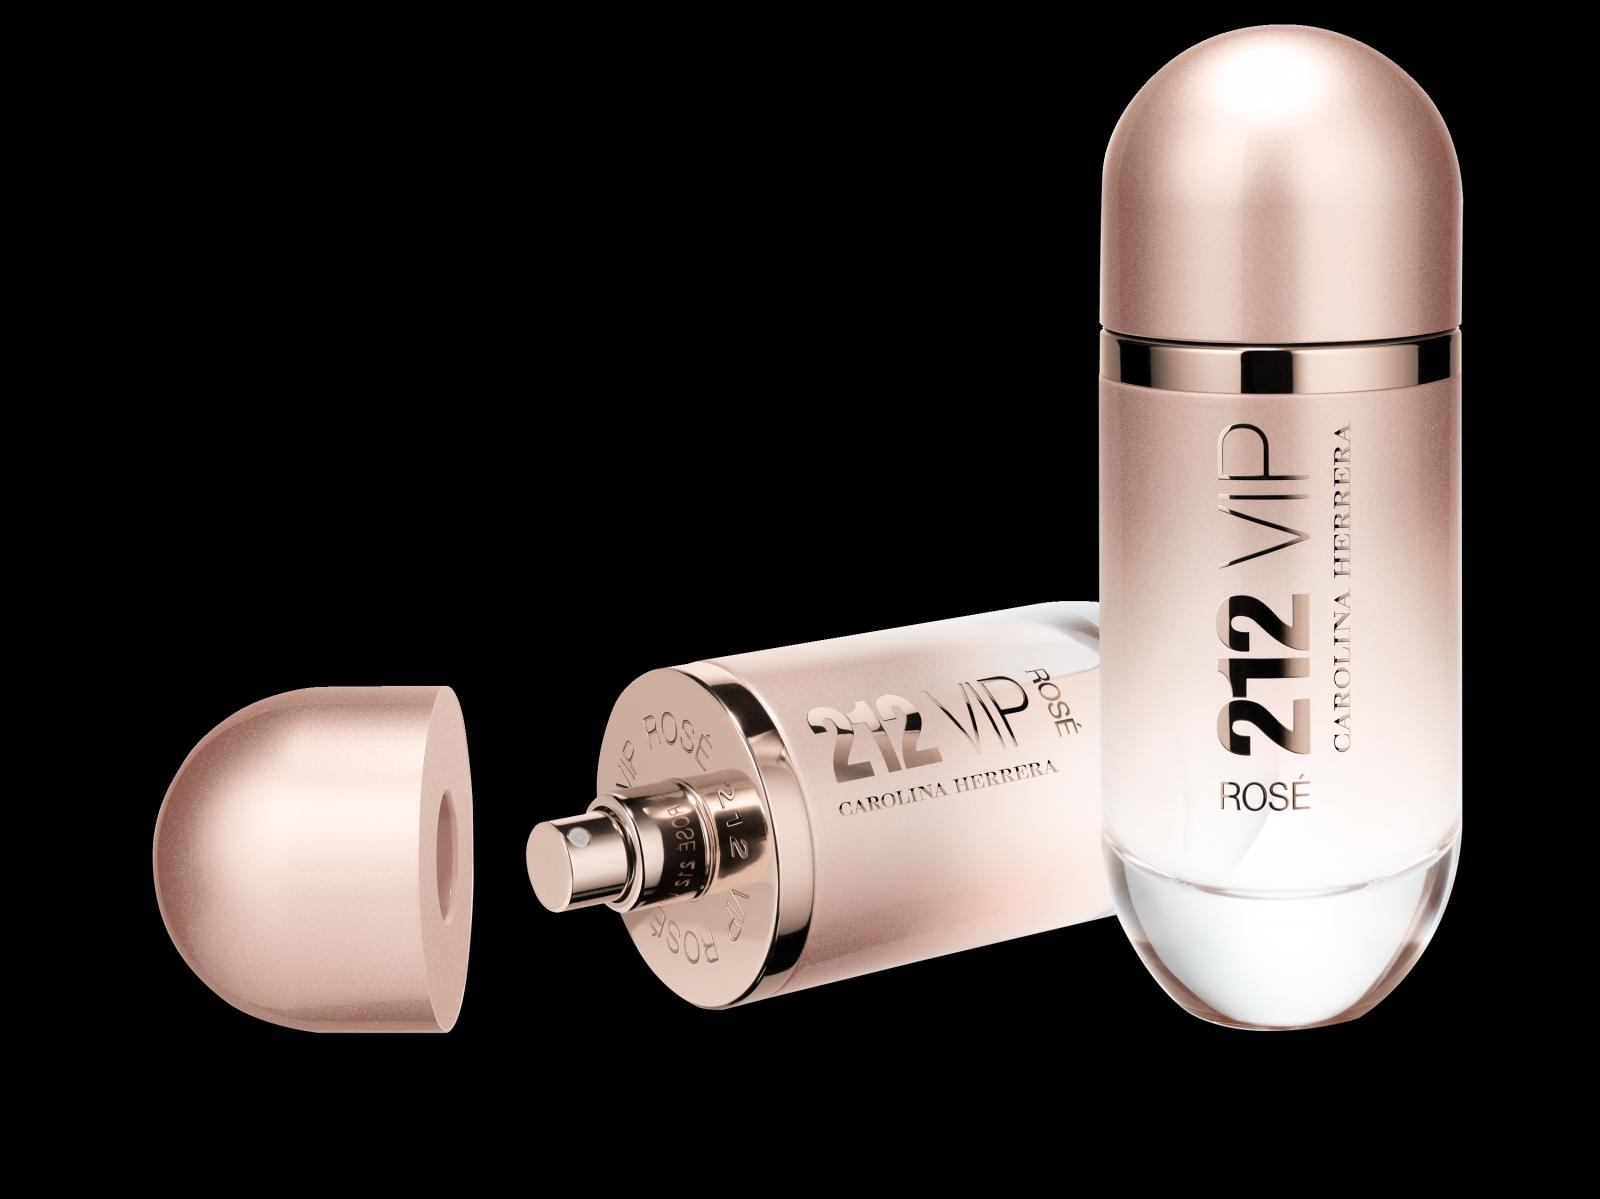 Brand Carolina Herrera Released A New Fragrance 212 Vip Rose Twirkl Women Edp 80ml